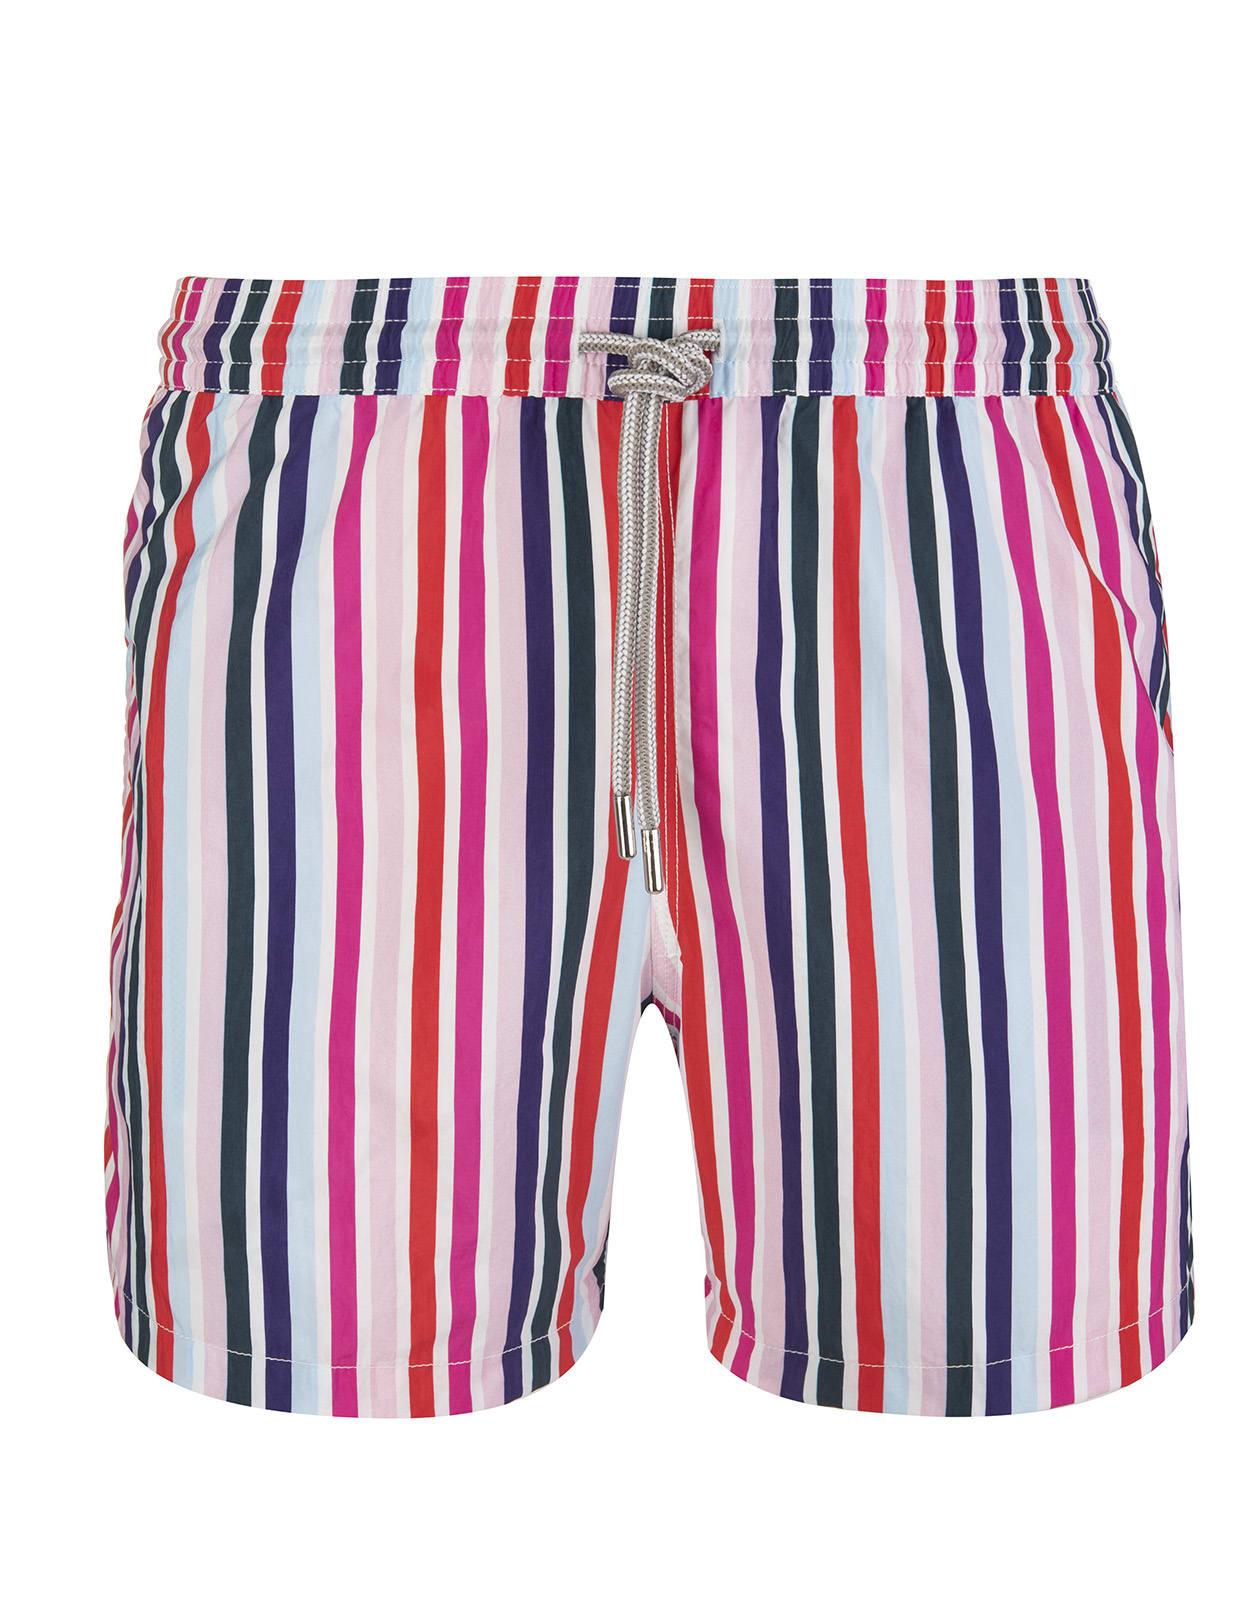 Multicolor Vertical Striped Swimsuit